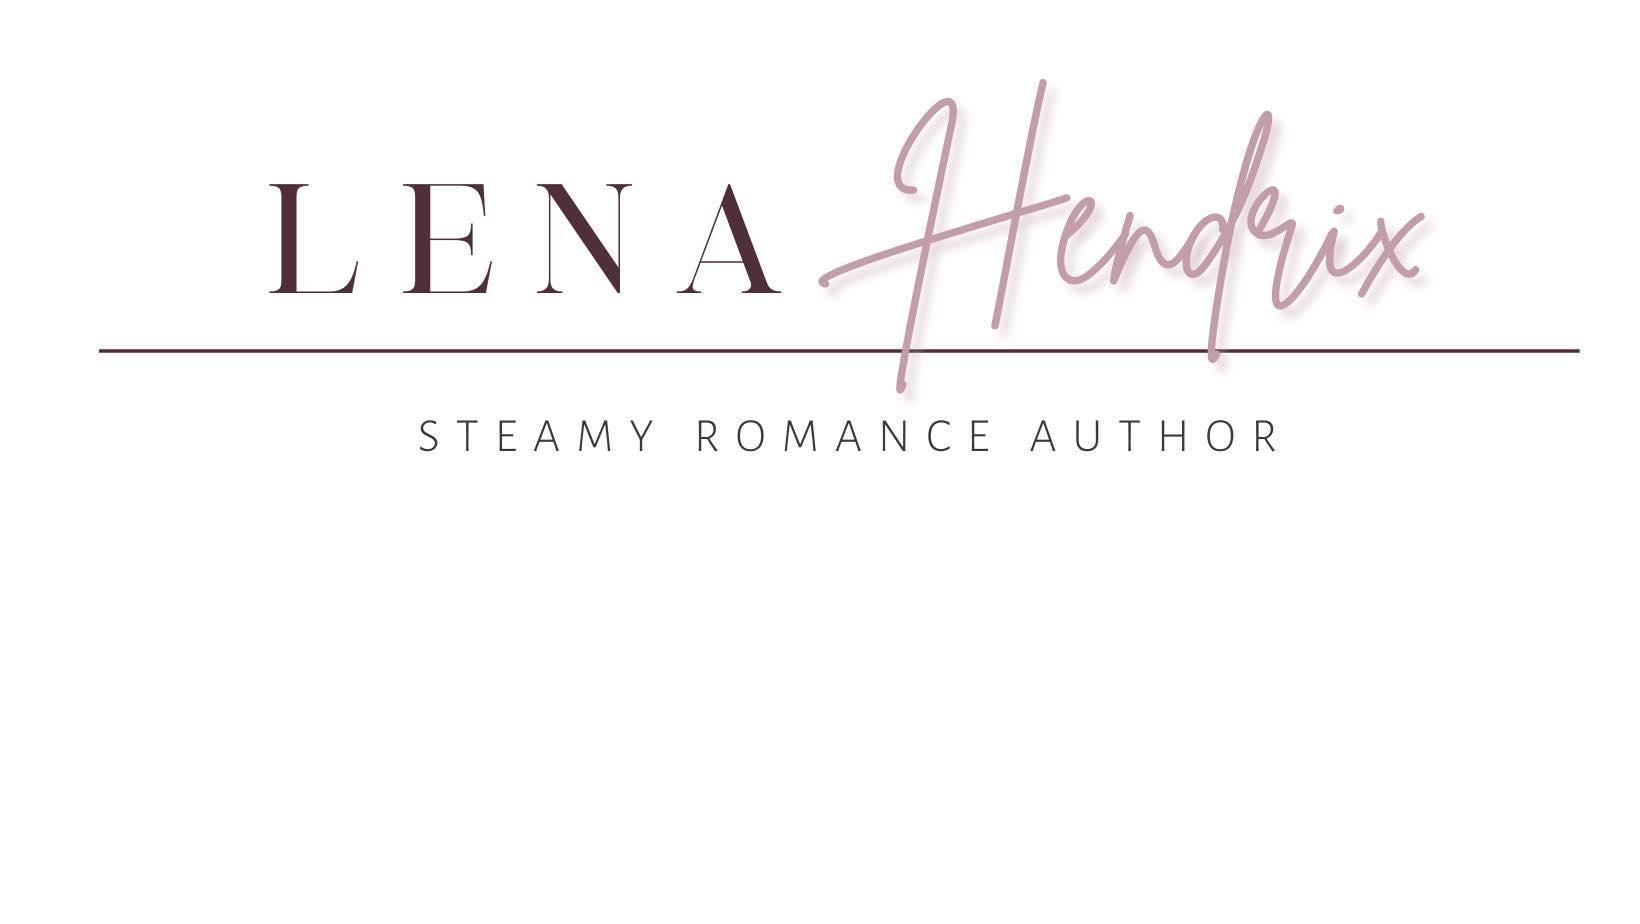 Lena Hendrix